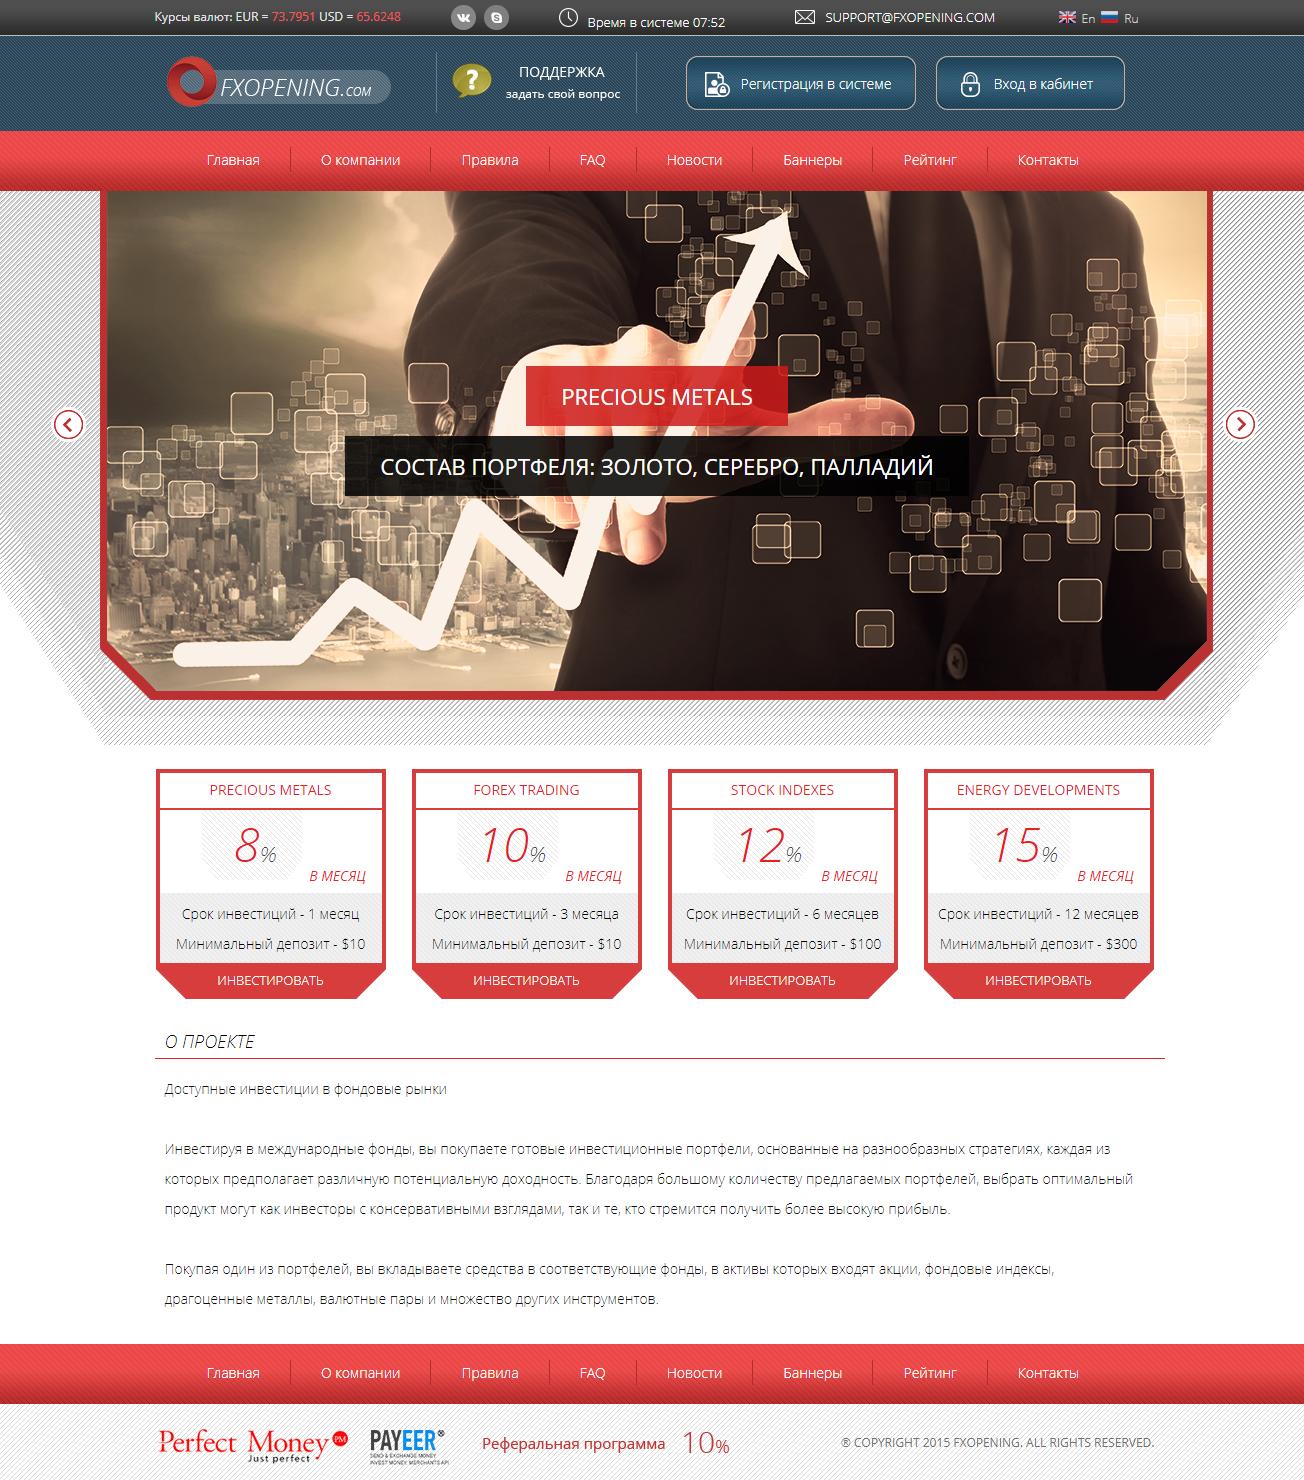 H-SCRIPT СКРИПТ Инвестиционного проекта  Fxopening